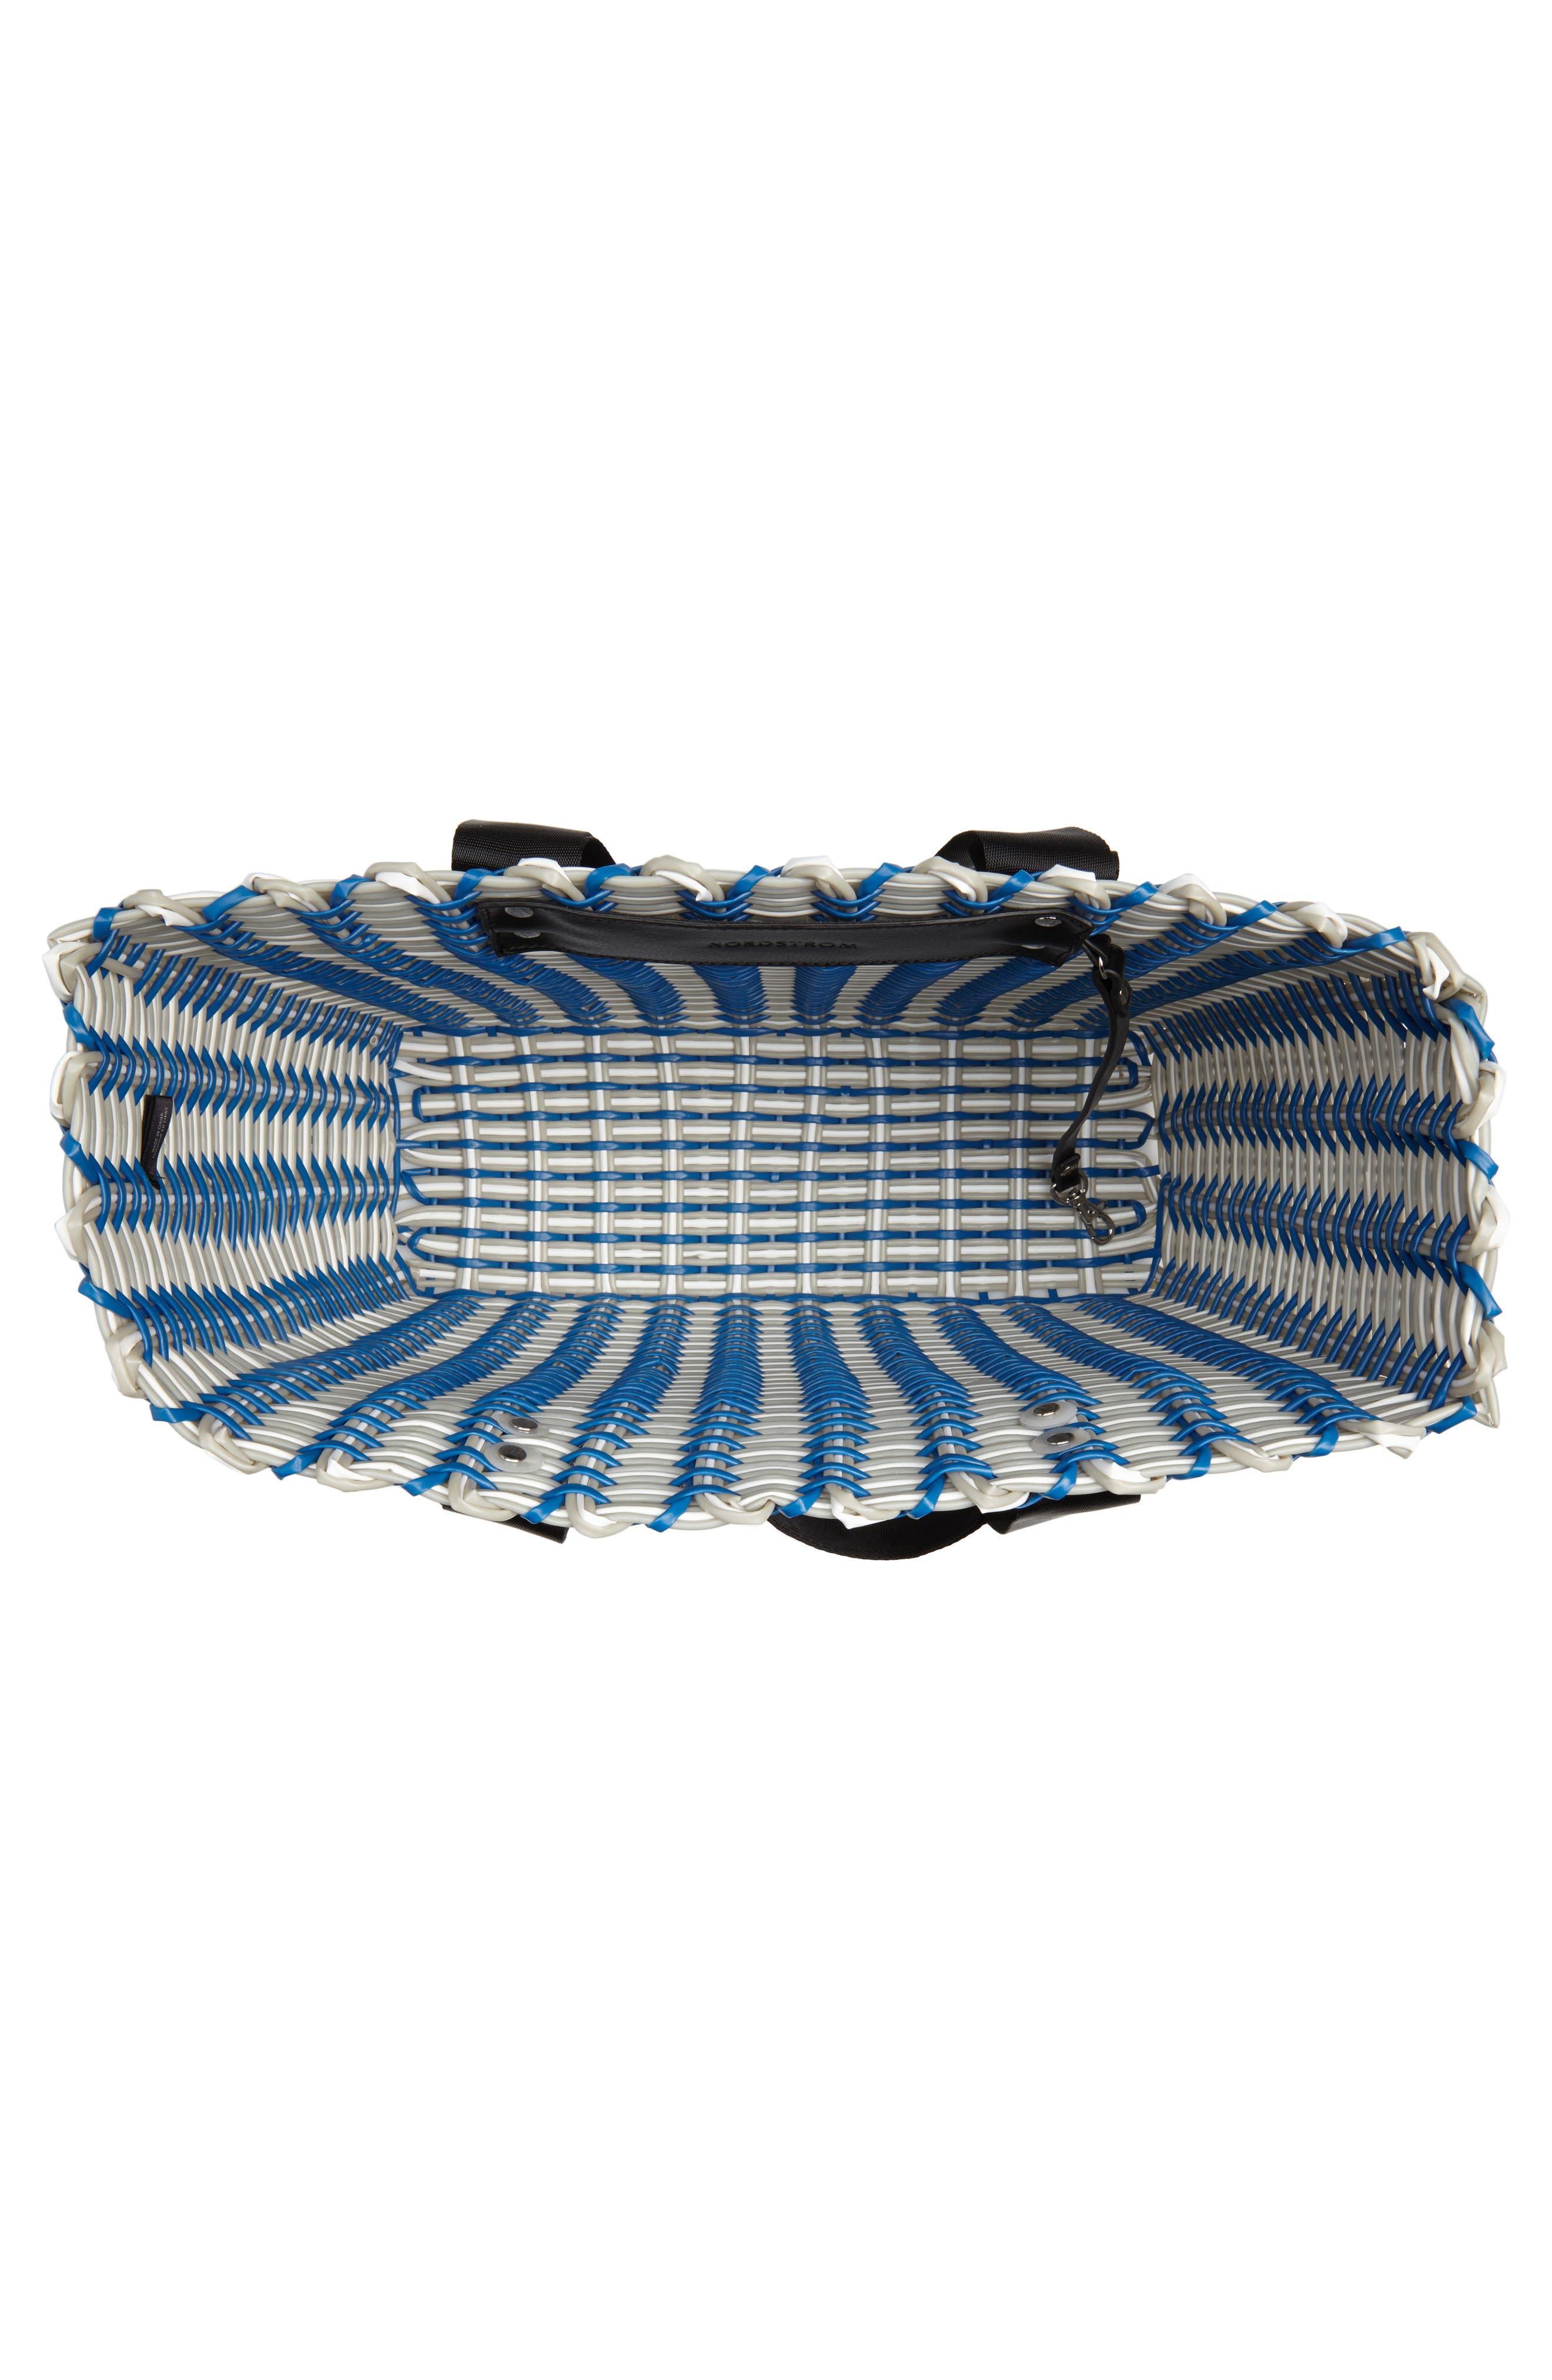 Stripe Woven Tote,                             Alternate thumbnail 4, color,                             Navy Blue